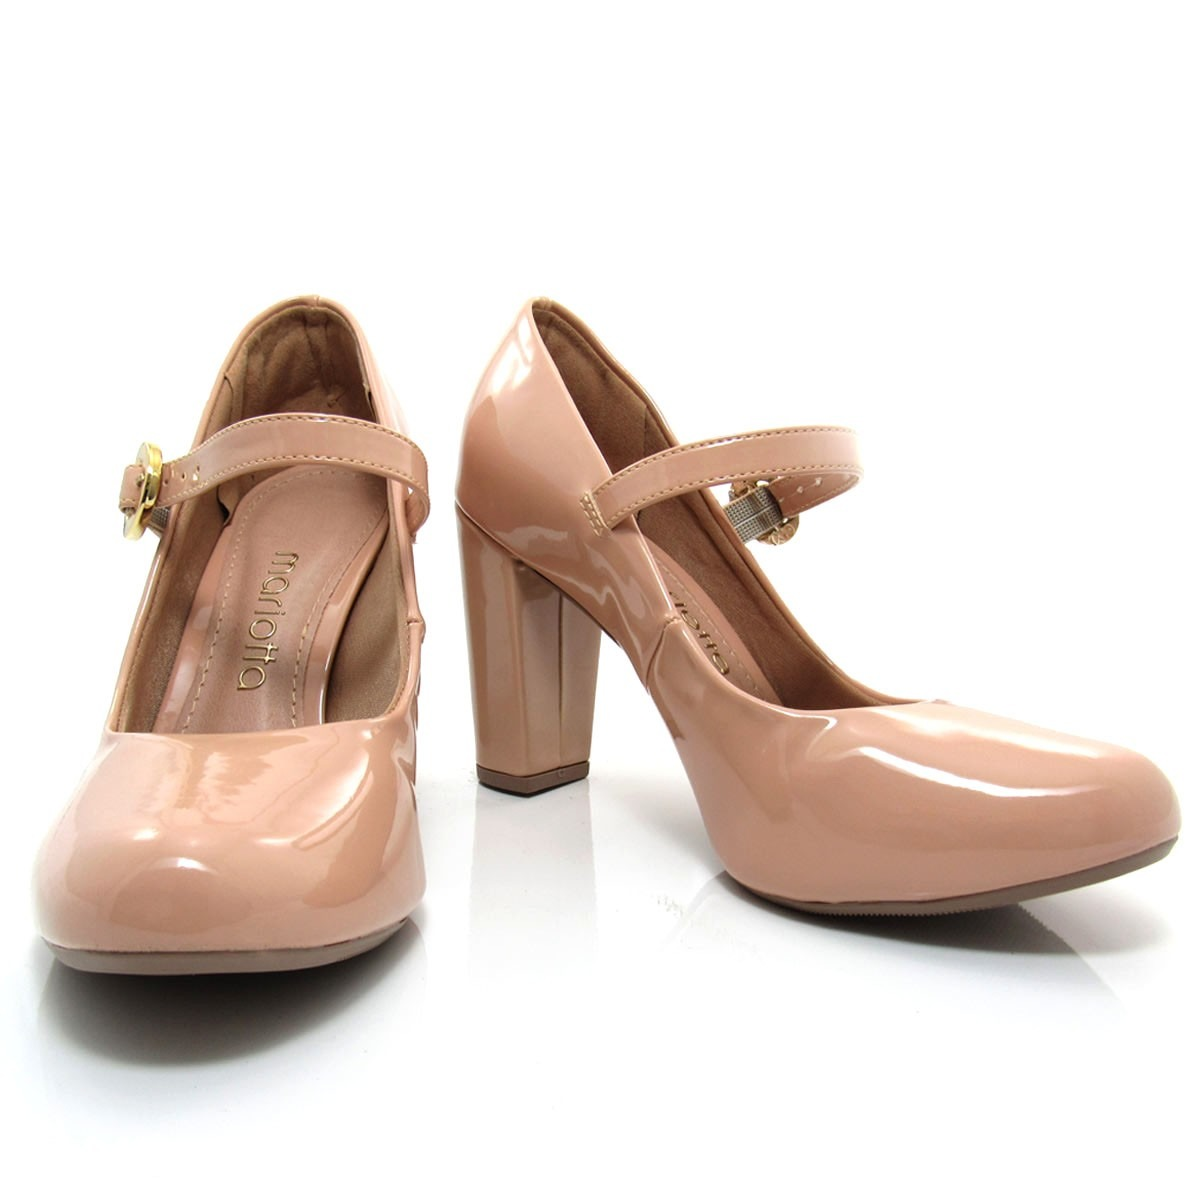 bcd7a4279 sapato boneca feminino mariotta bico redondo 17010-02 verniz. Carregando  zoom.